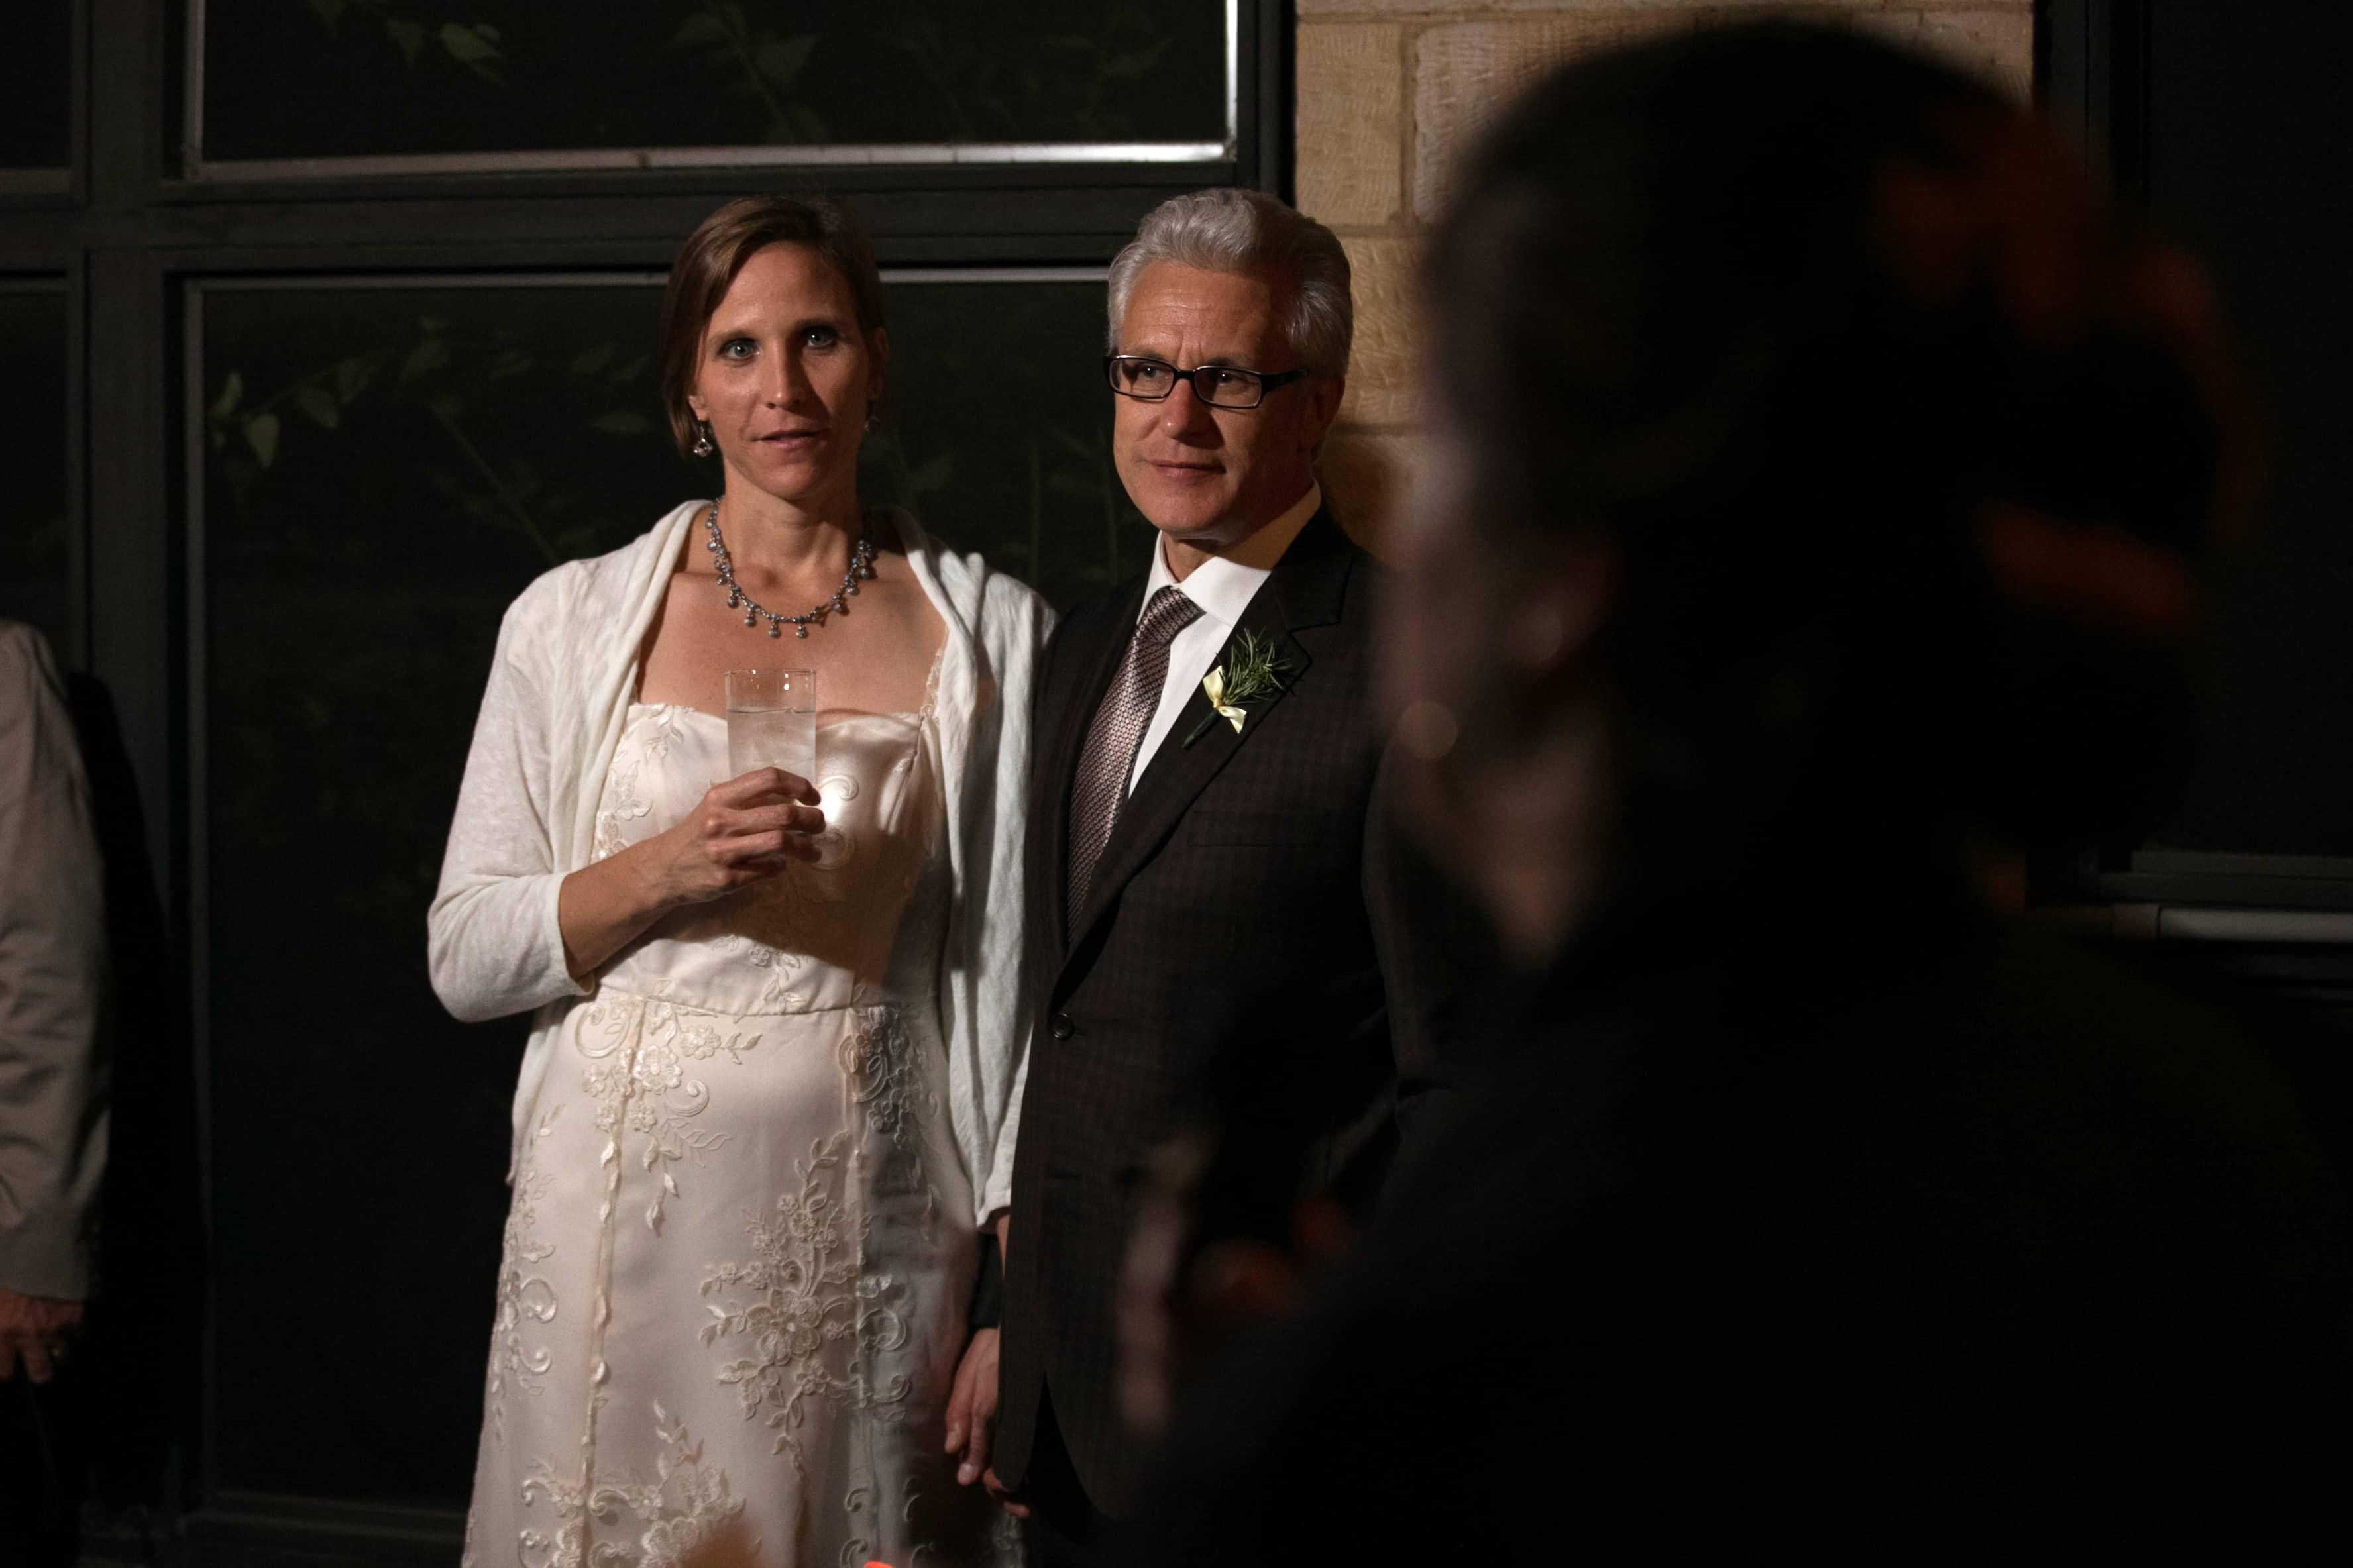 bride and groom listening to speech